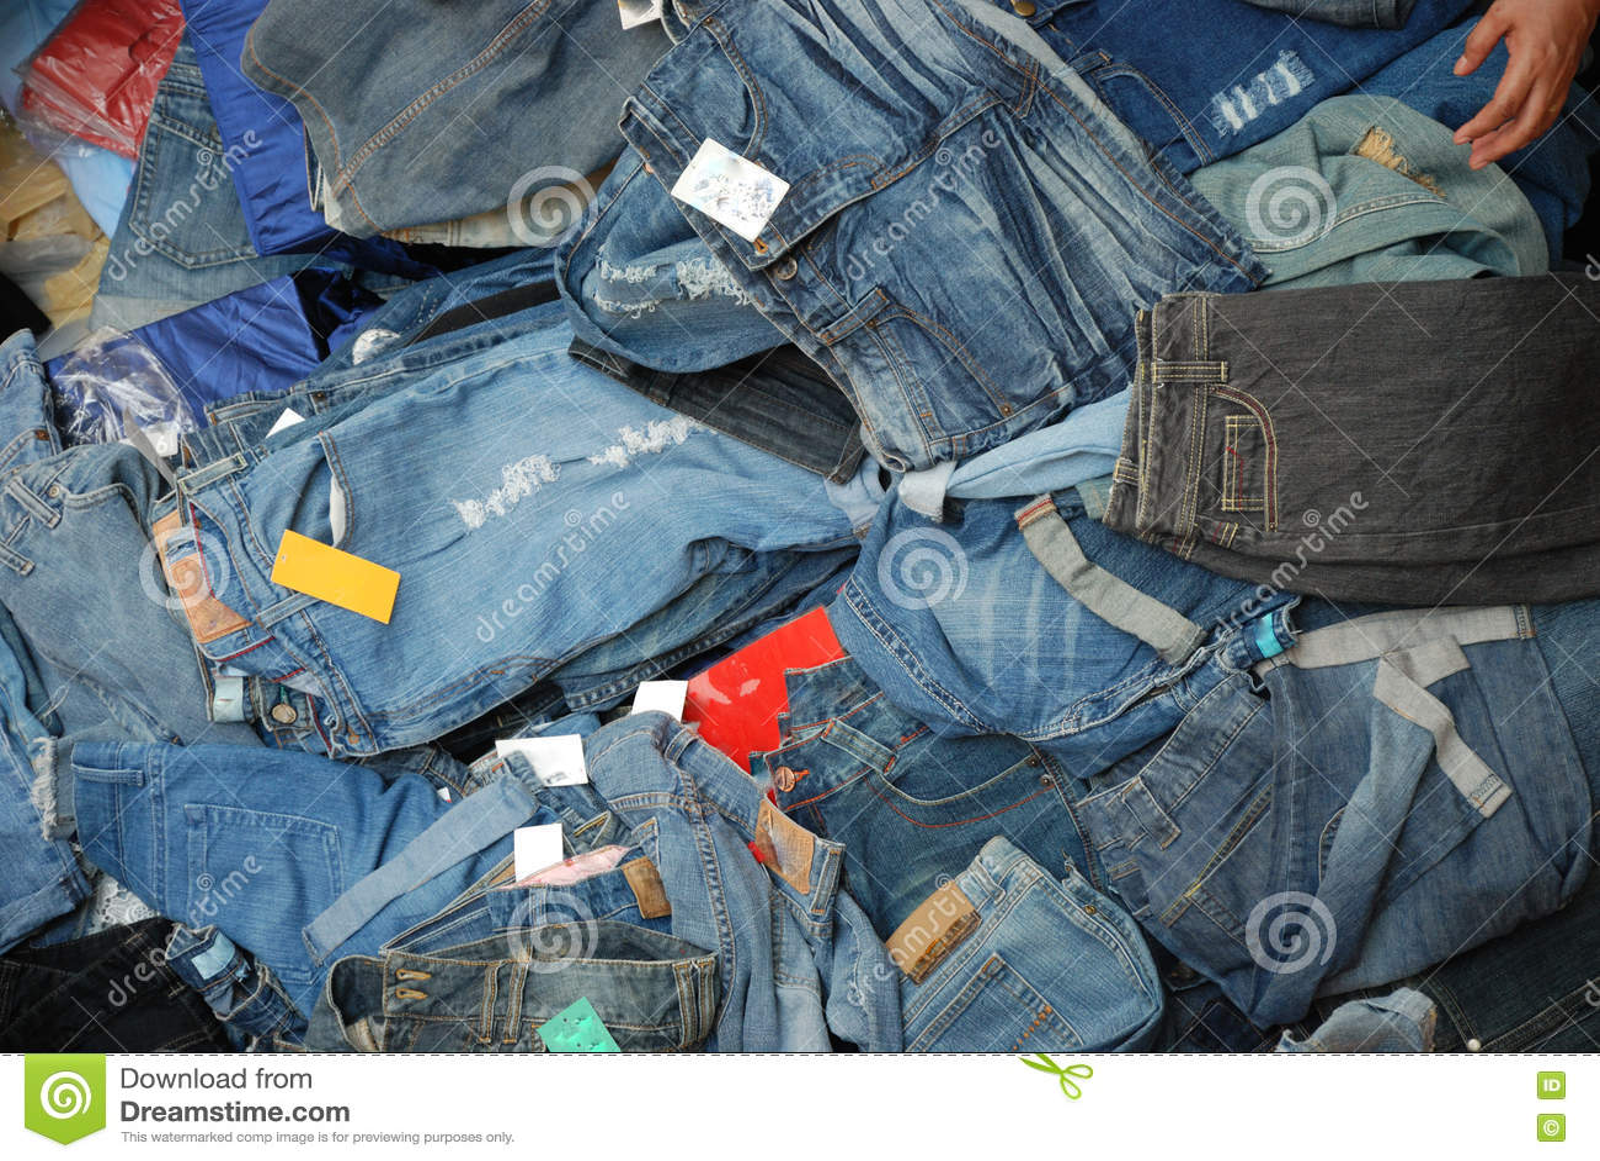 a pile of jeans denim pants stock photo image 76351237. Black Bedroom Furniture Sets. Home Design Ideas